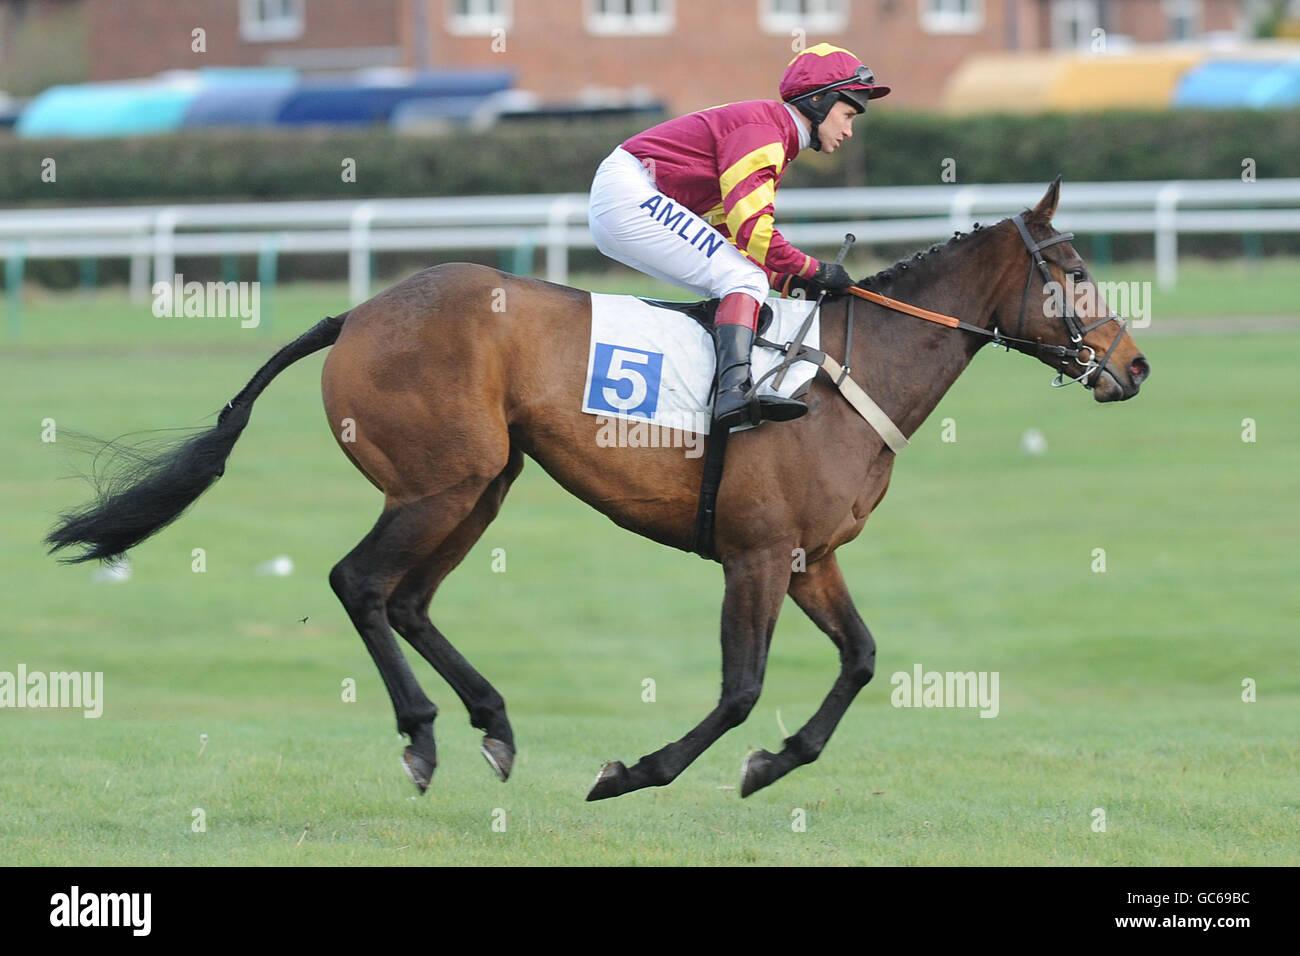 Horse Racing - Leicester Racecourse - Stock Image